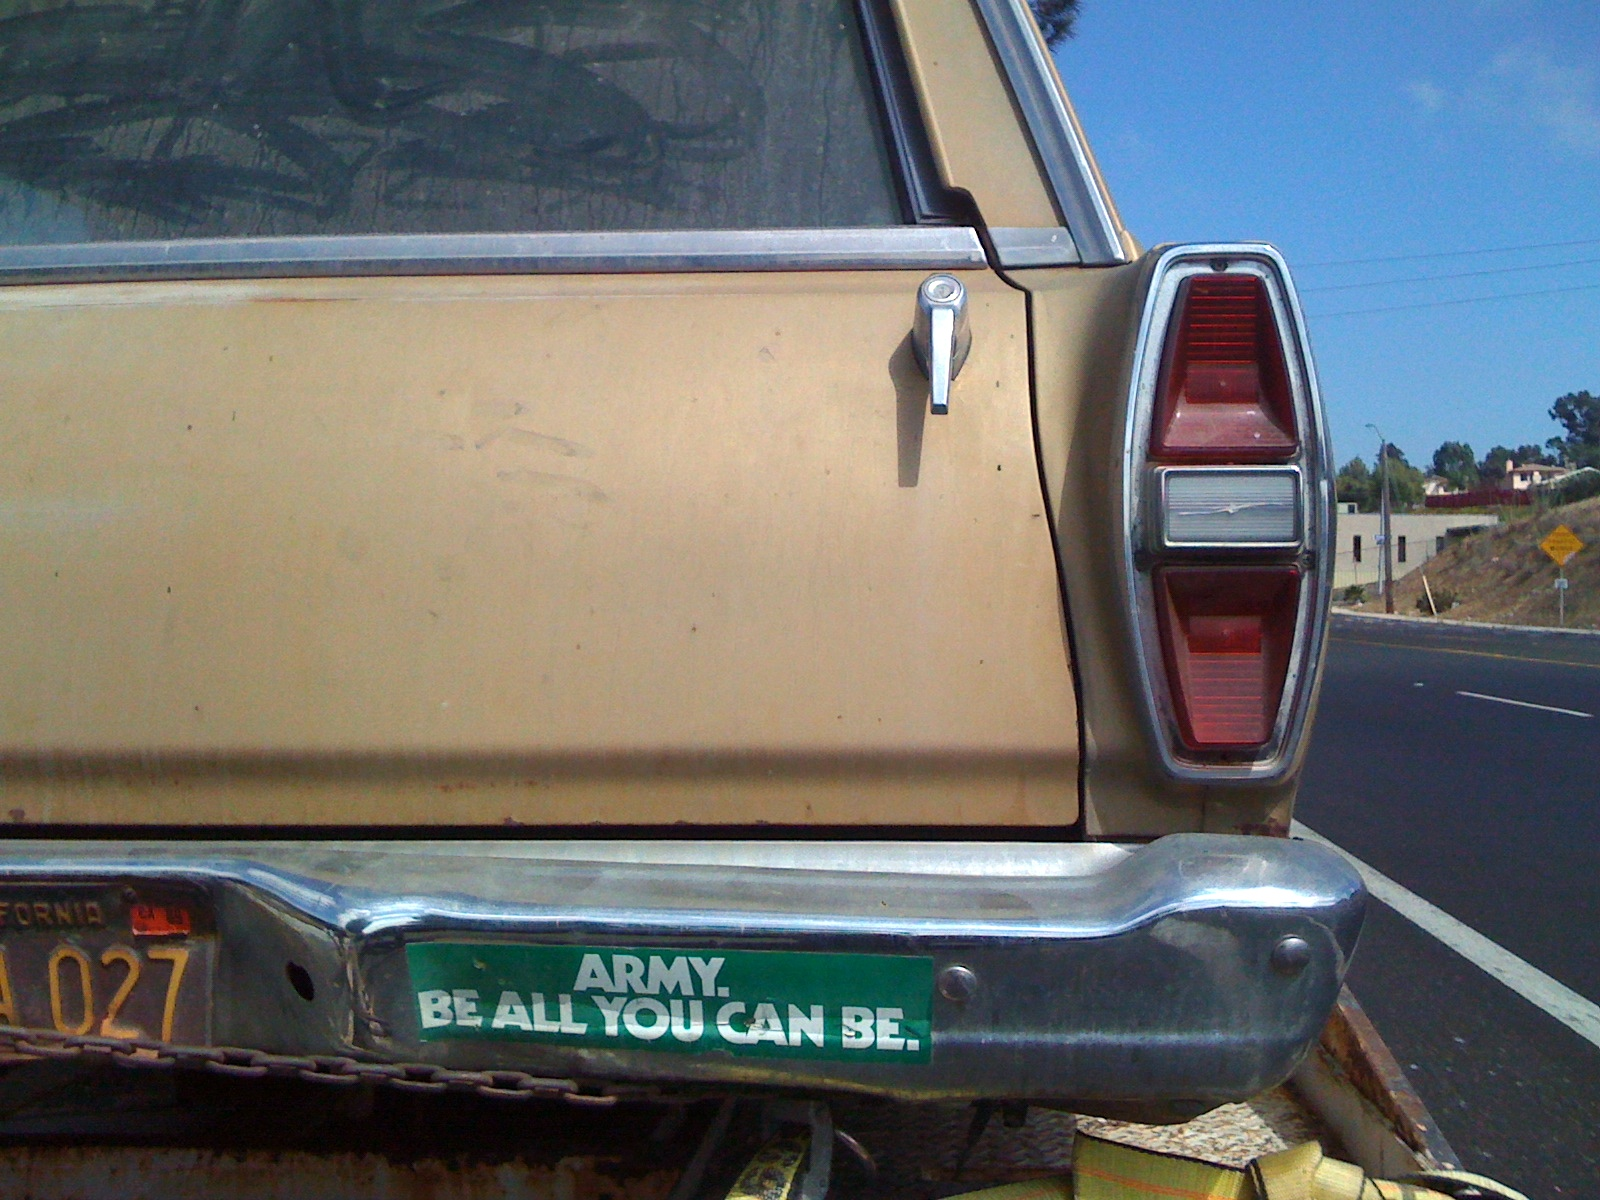 1970 Opel Rekord C Caravan Car ford country sedan